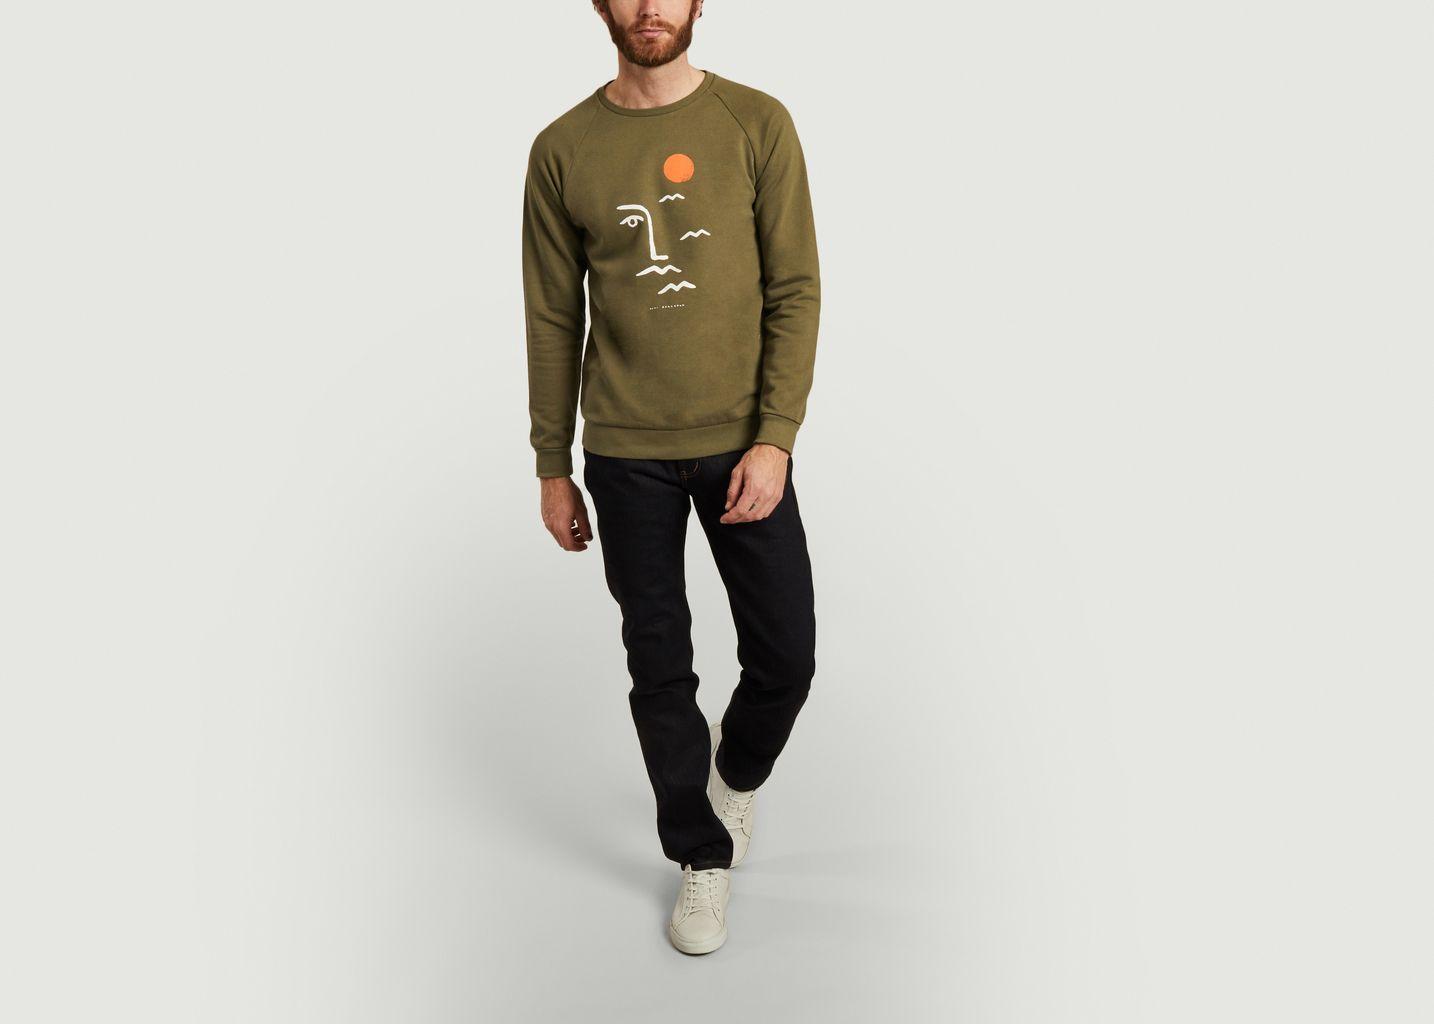 Sweater Moolight - Bask in the Sun